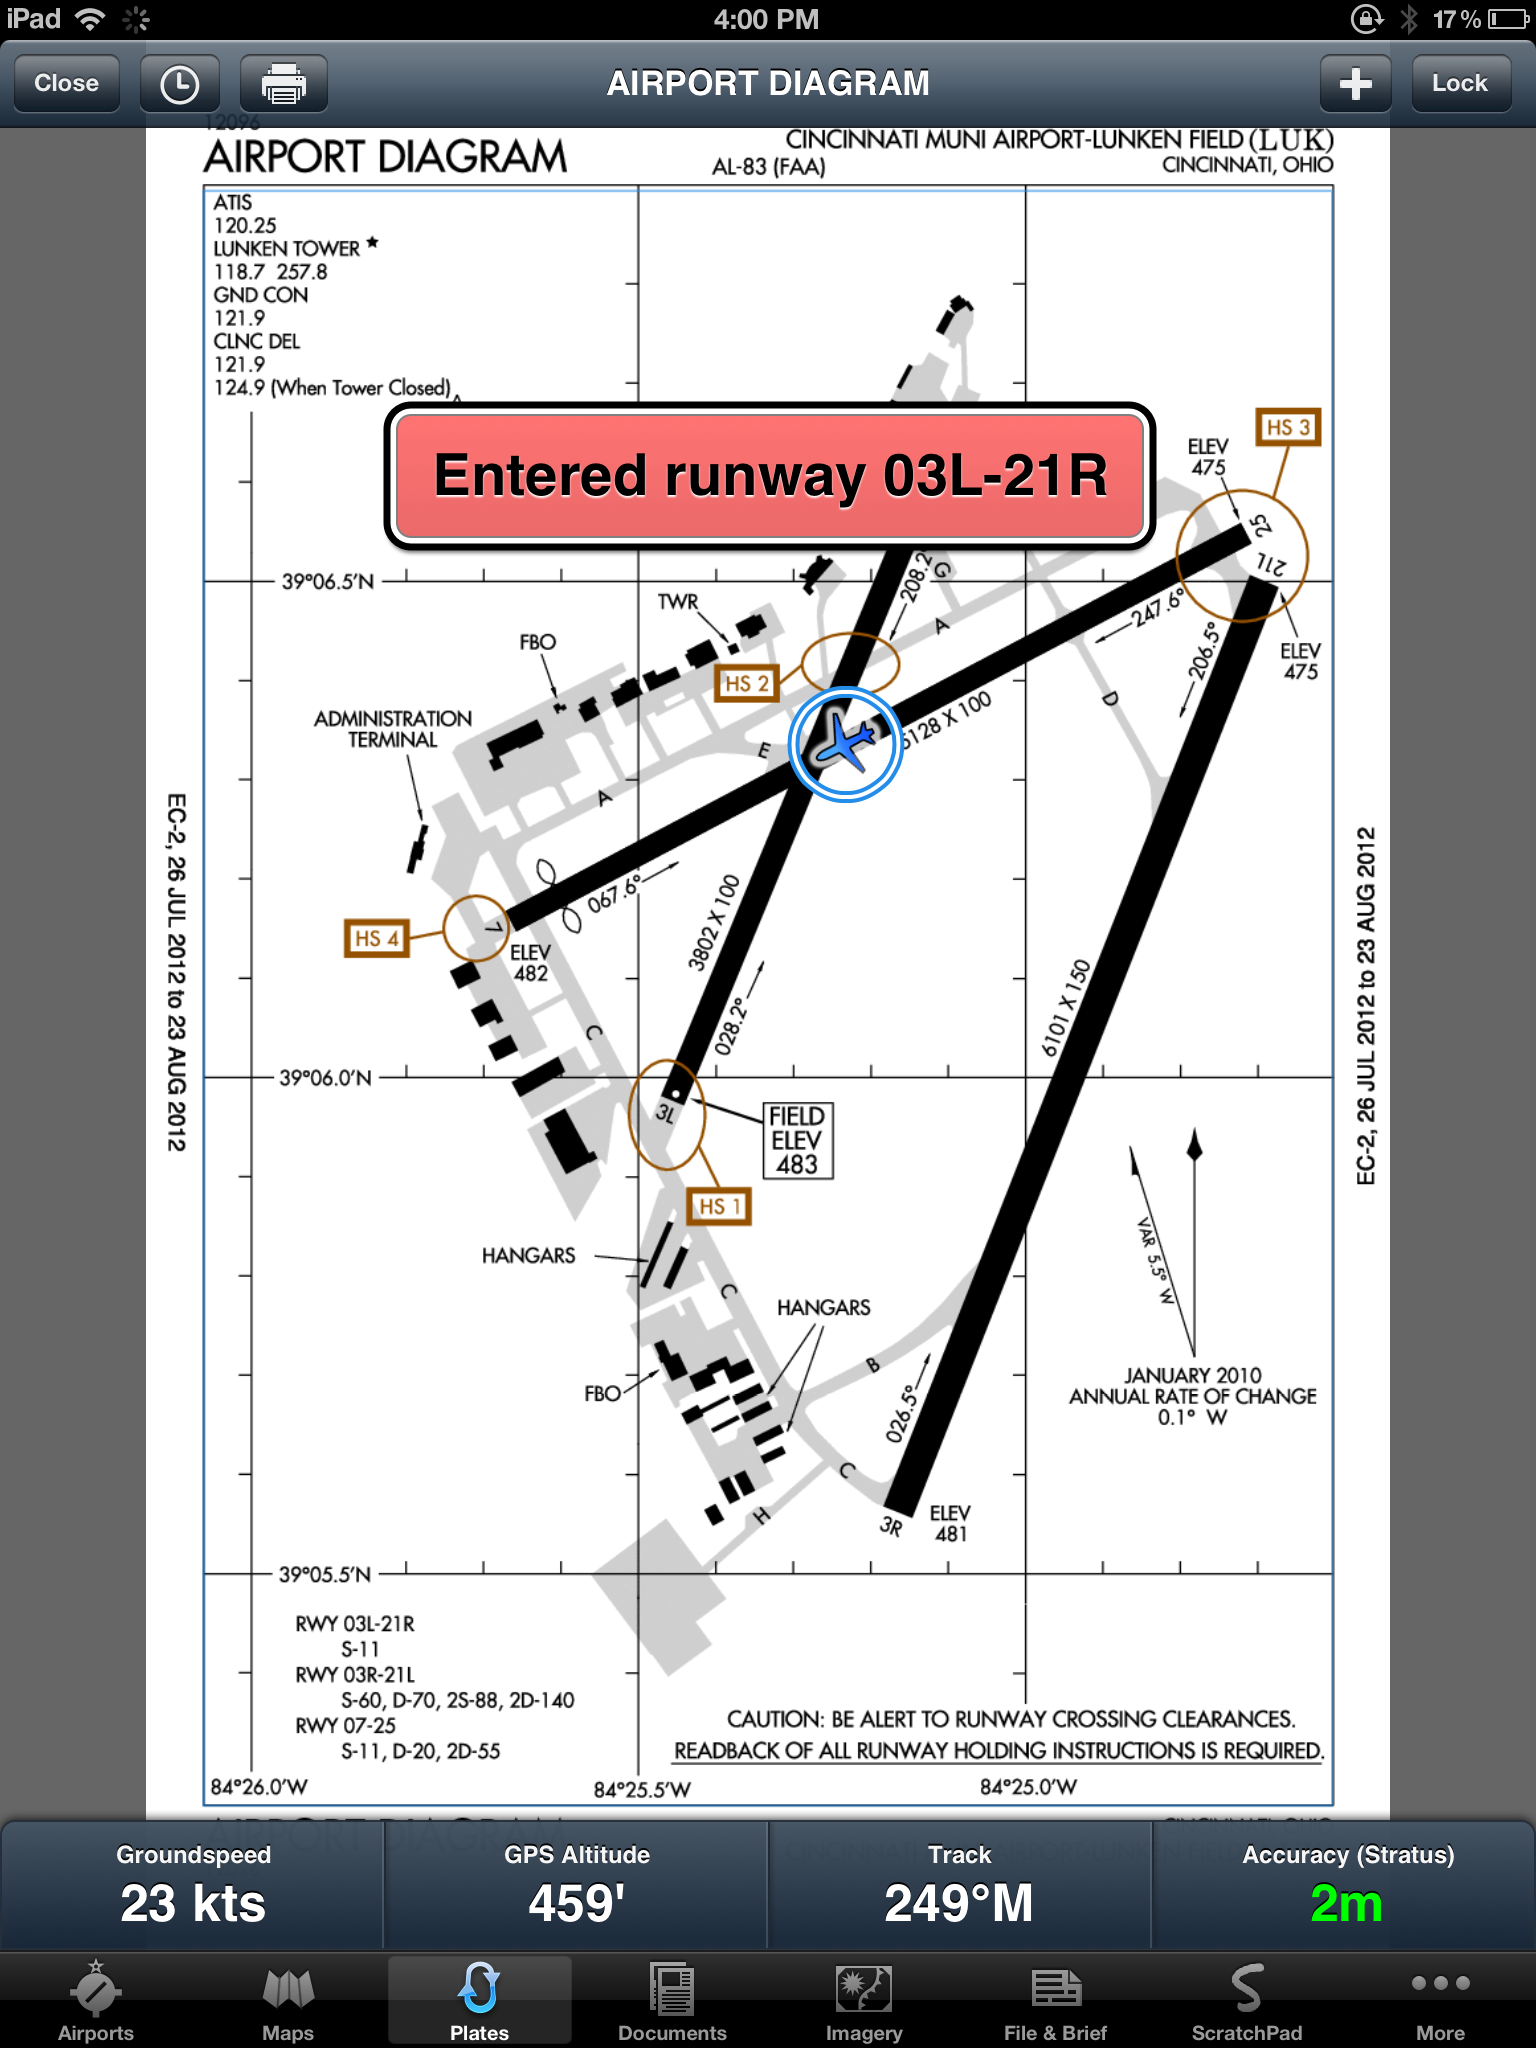 Foreflight Mobile adds new Runway Proximity Advisor